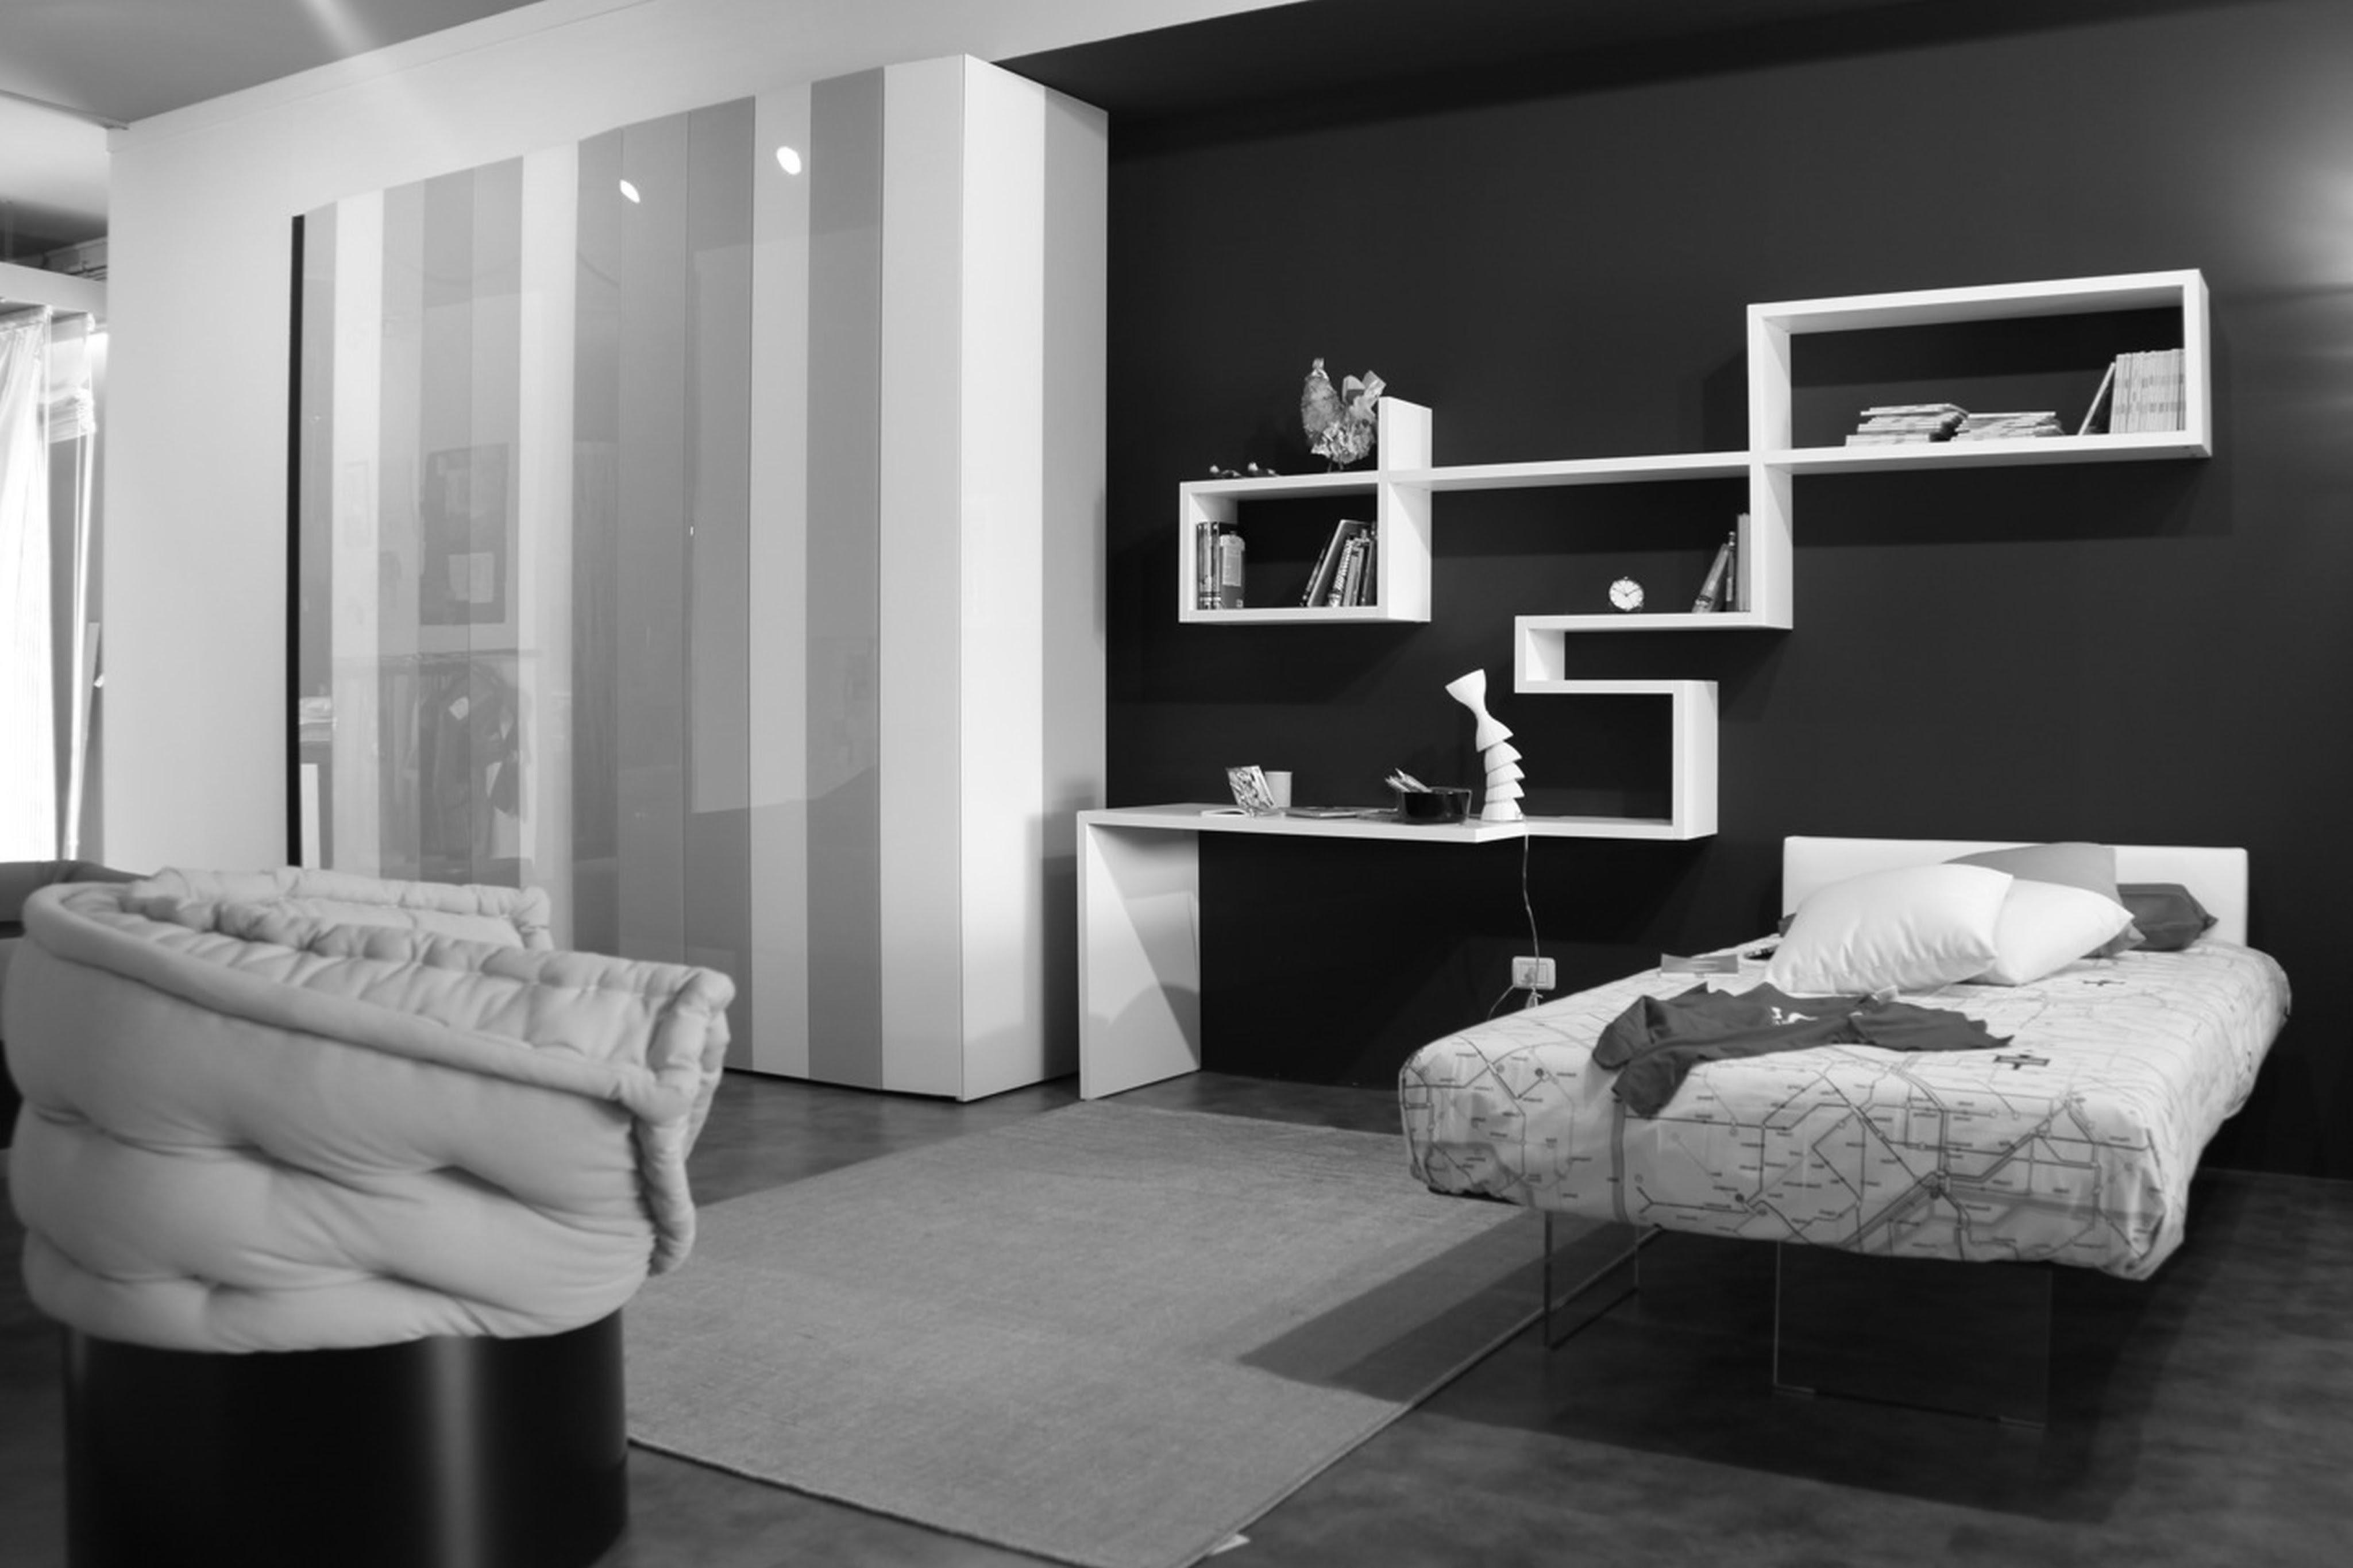 10 Wonderful Black And White Bedroom Ideas black and white wall art for bedroom home design ideas youtube 2020